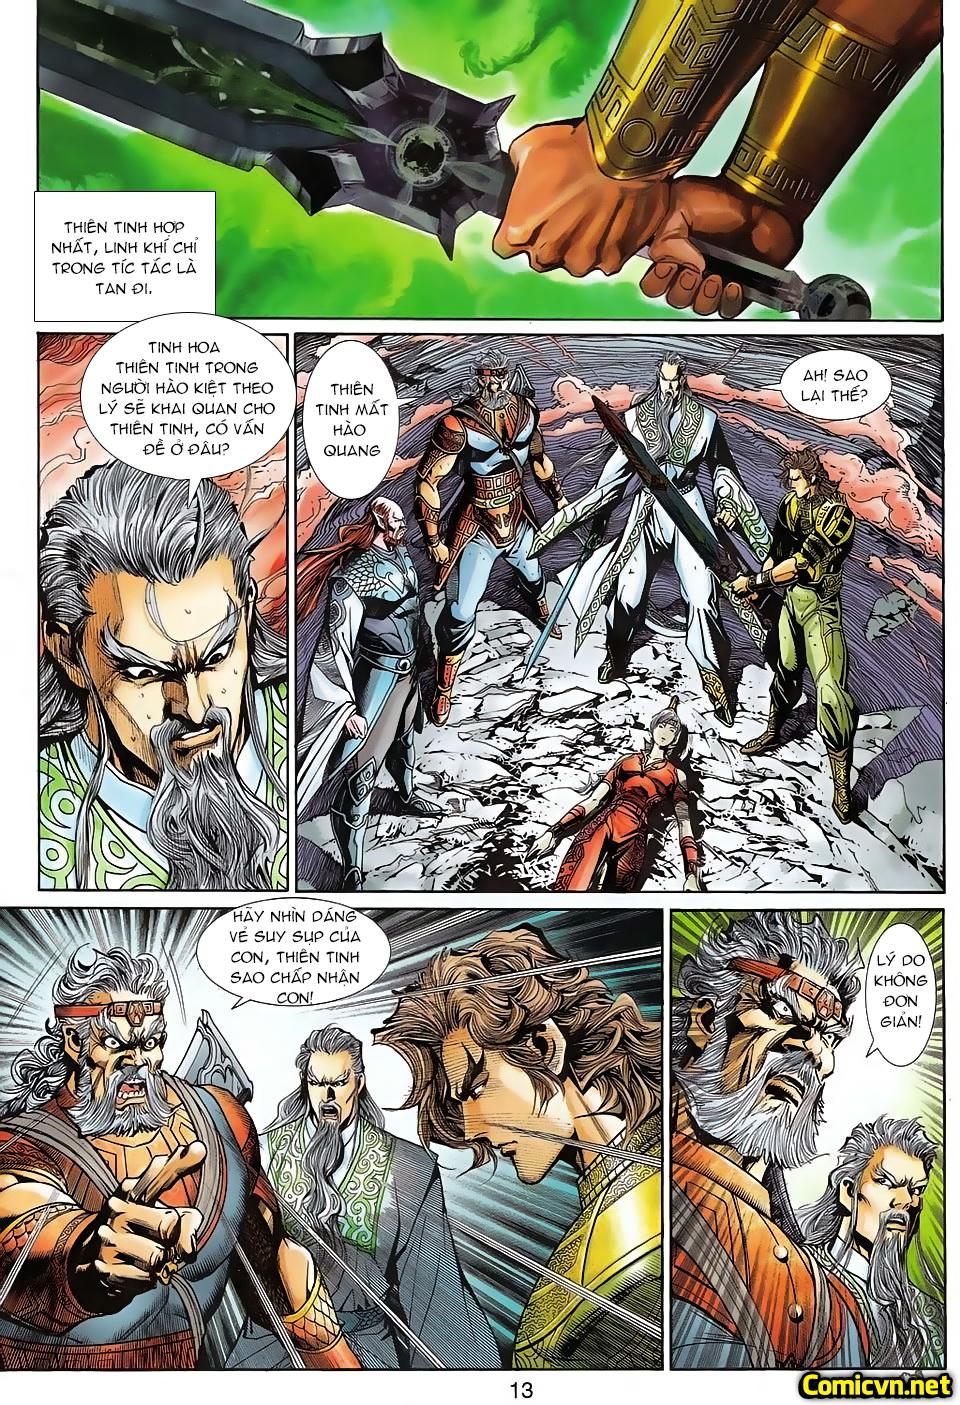 Thần binh huyền kỳ 3 - 3.5 Chapter 94 - Hamtruyen.vn